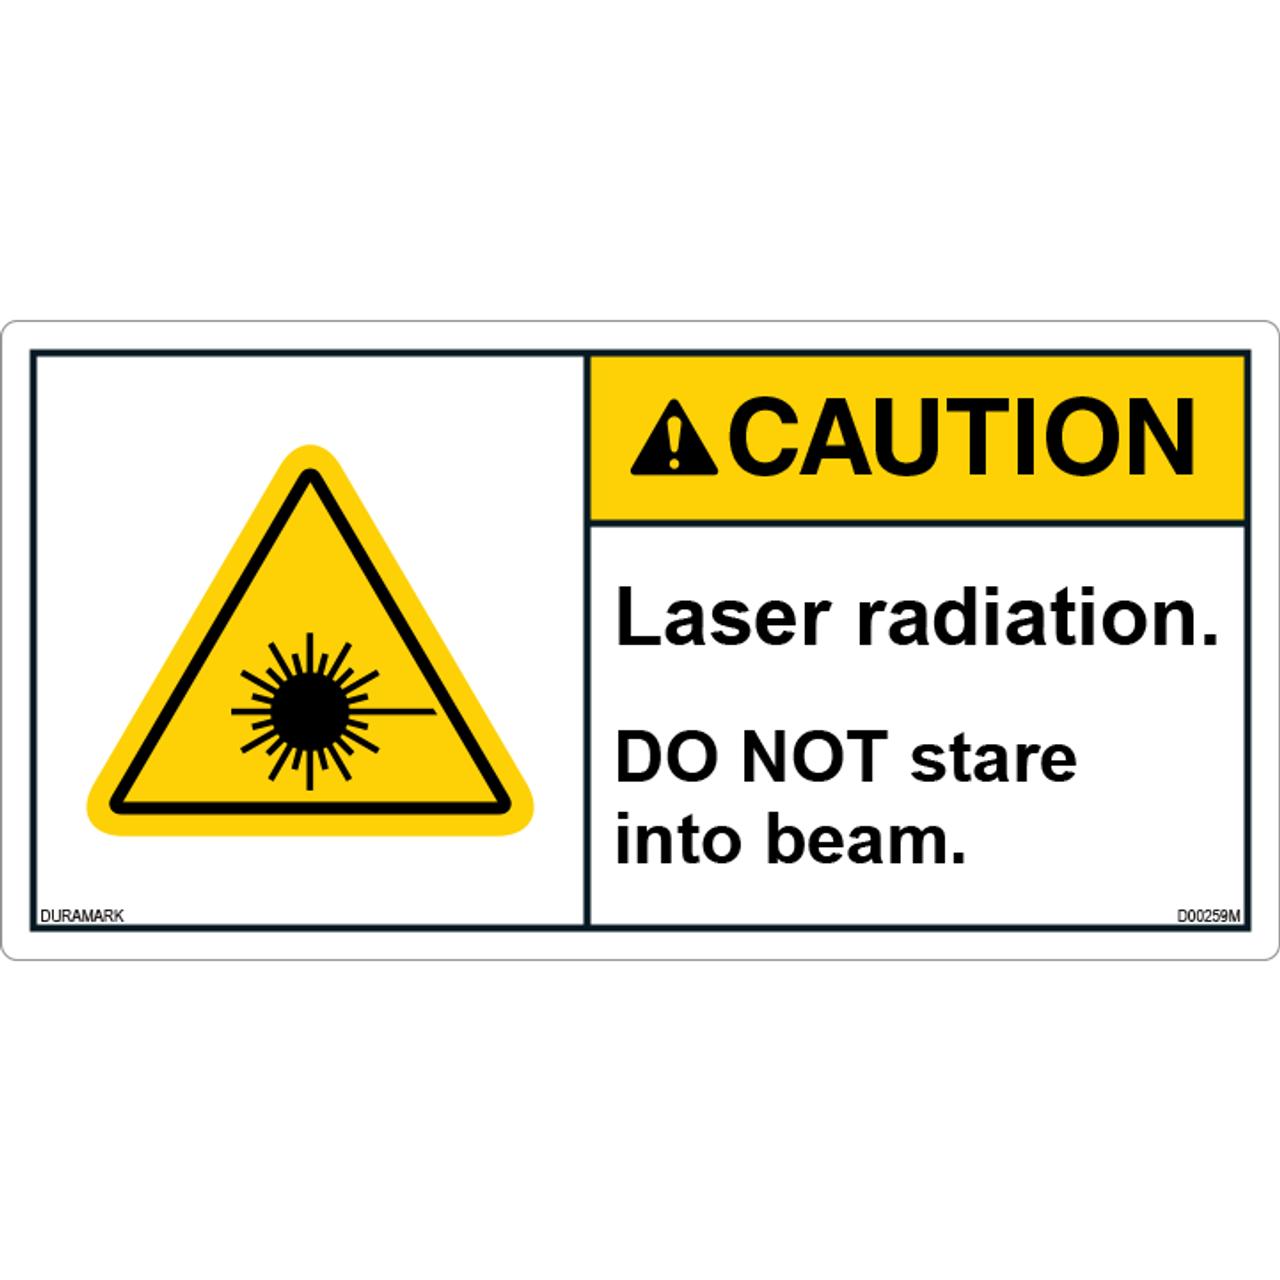 ANSI Safety Label - Caution - Laser Radiation - Do Not Stare